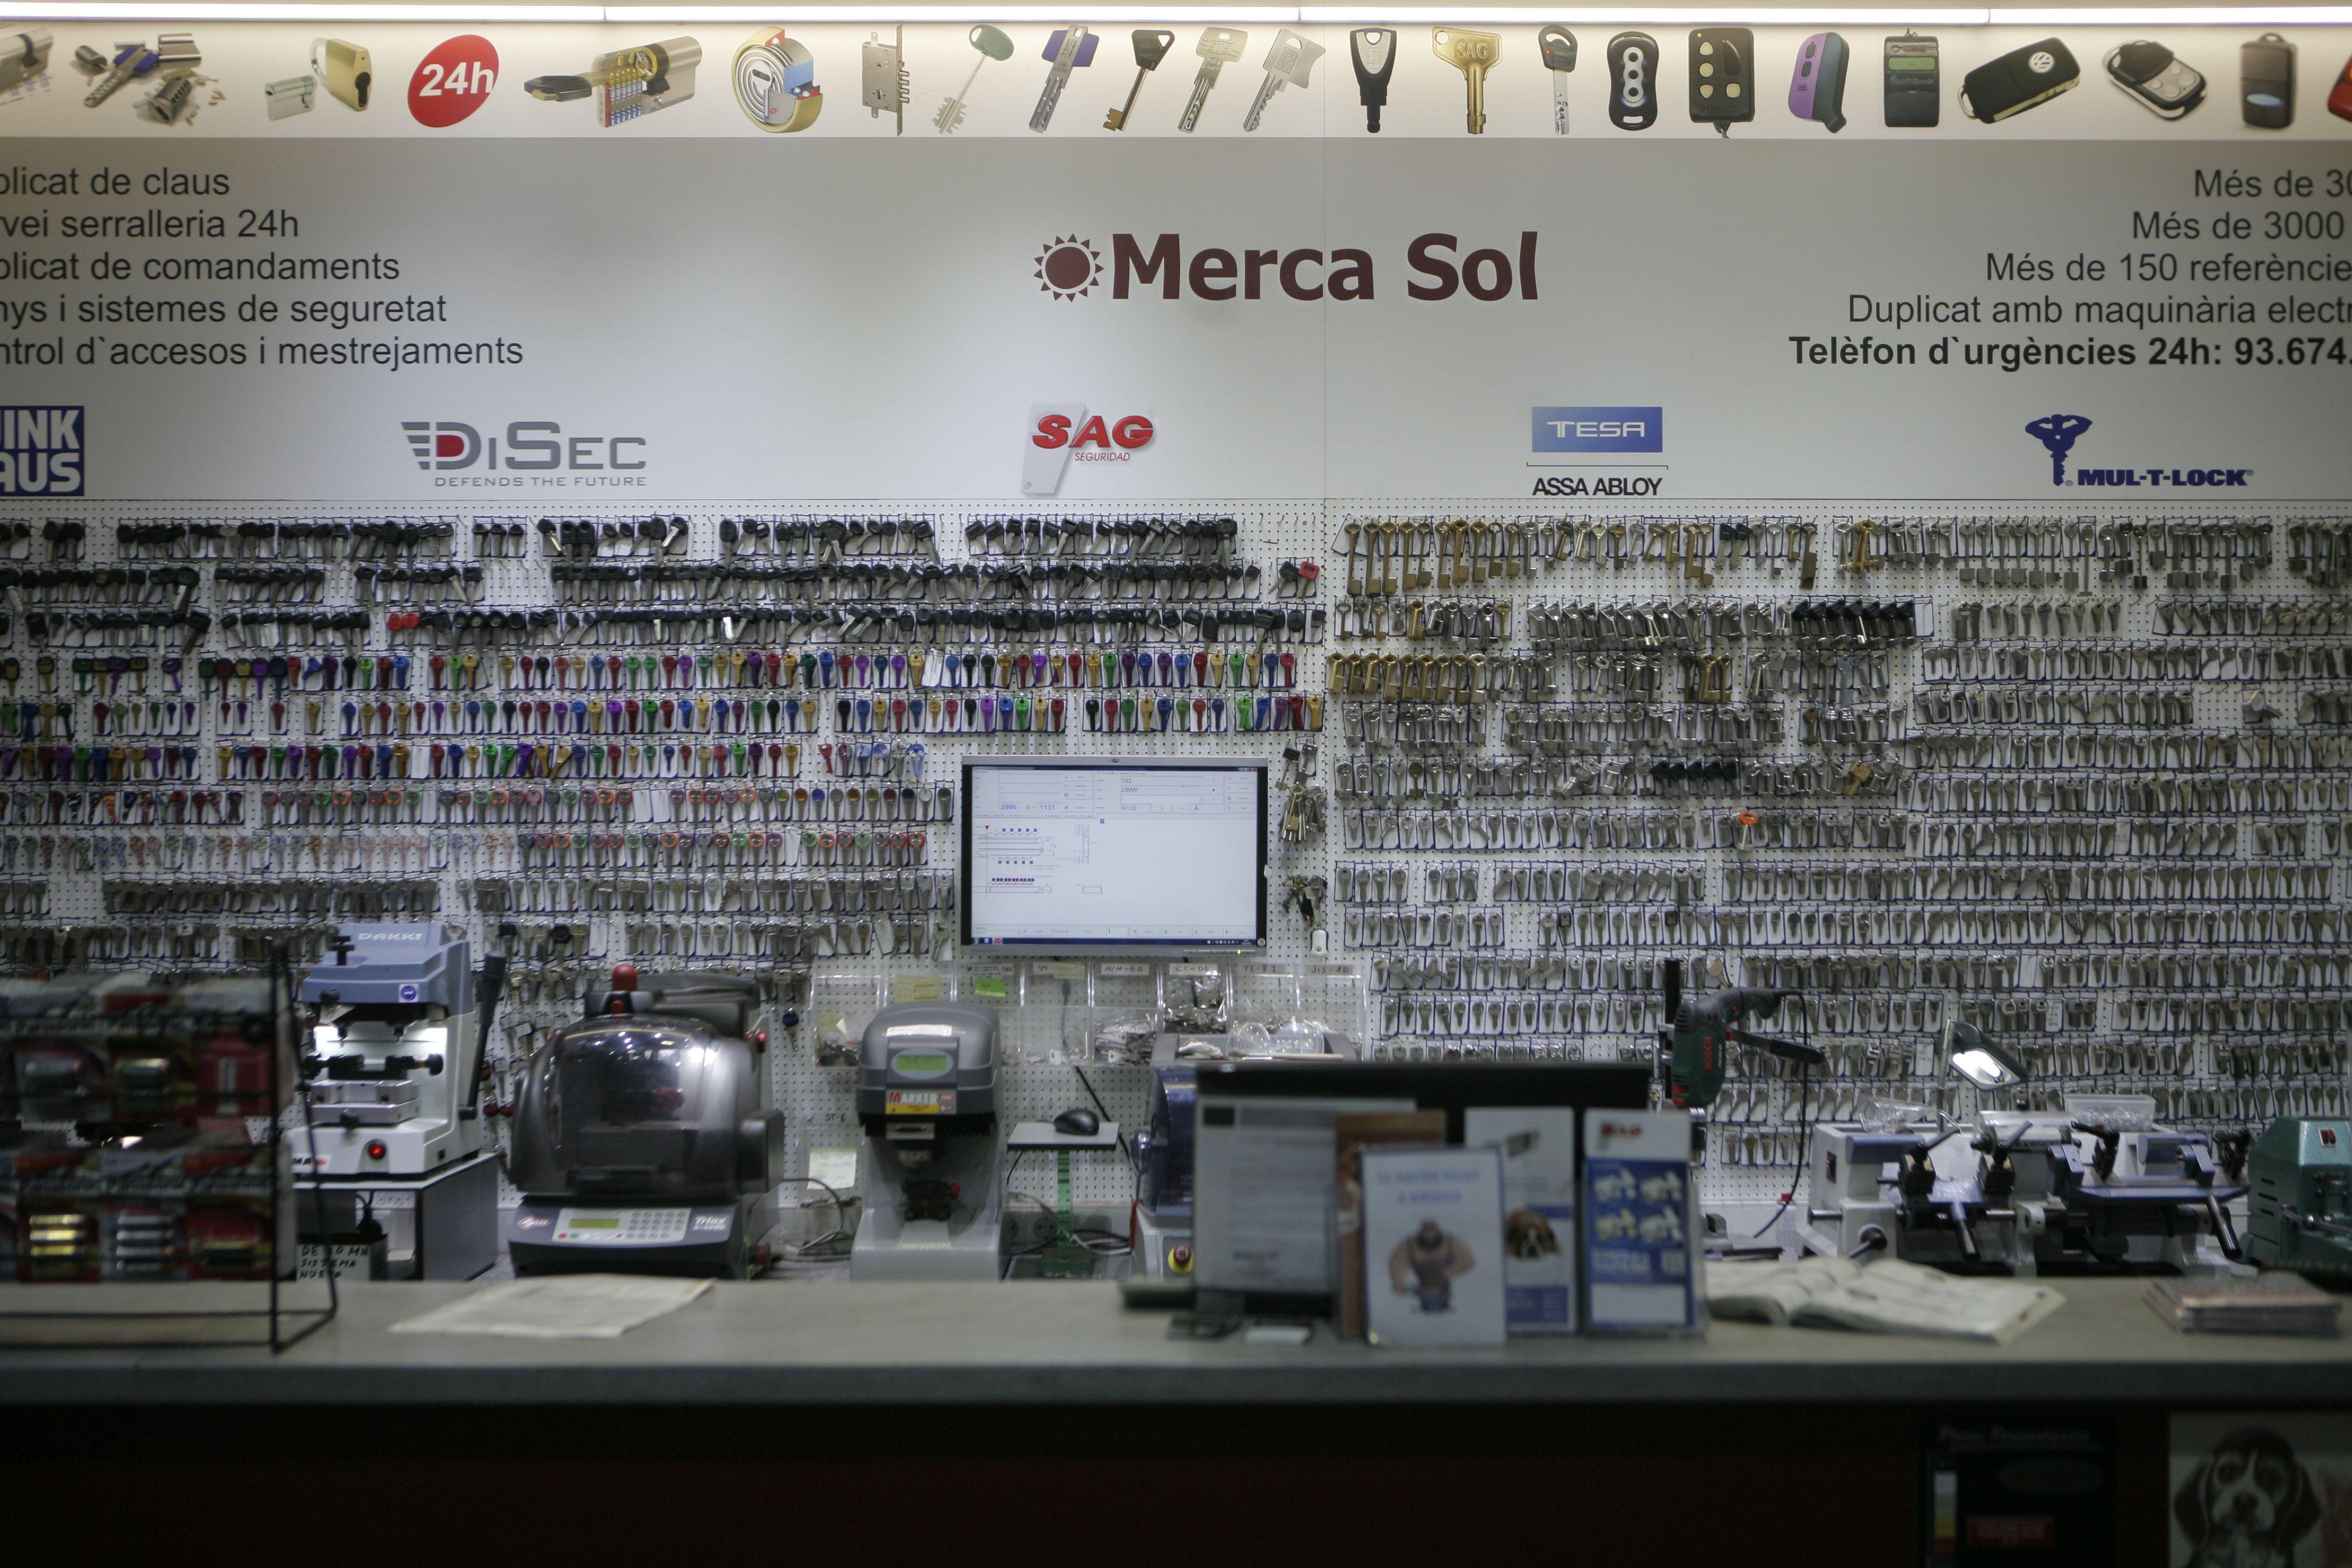 Mercasol 2